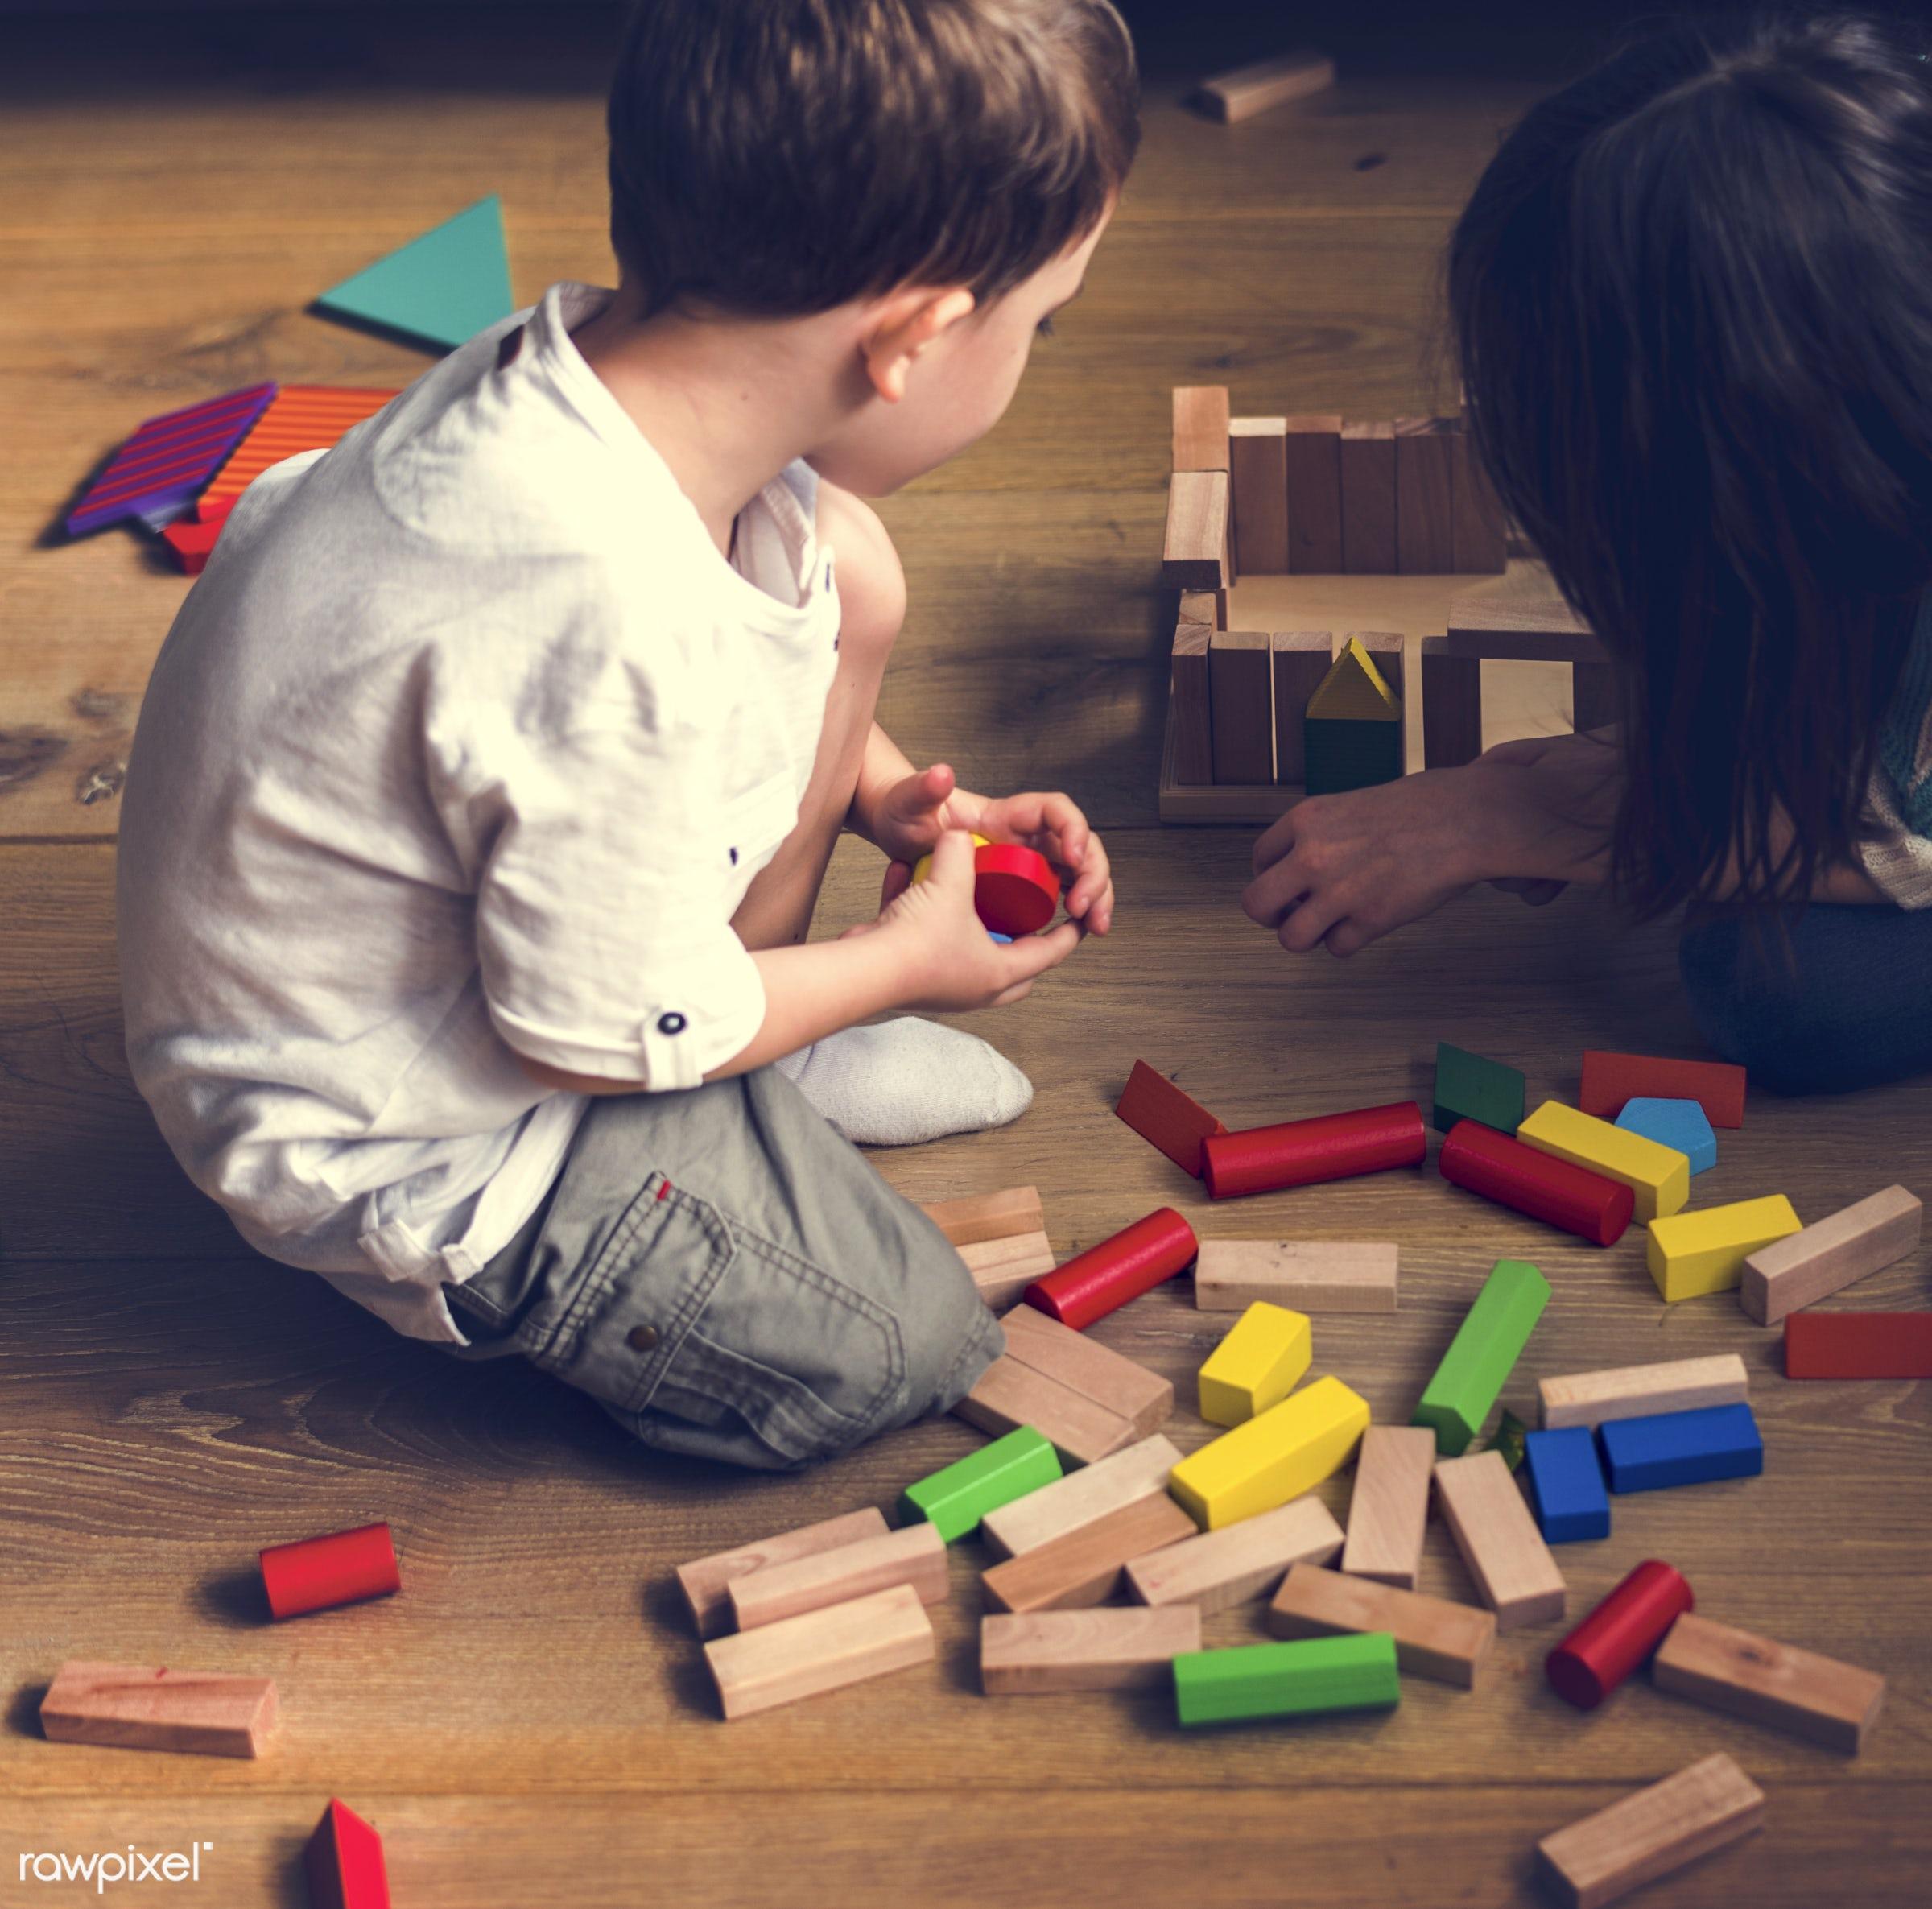 blocks, bond, bonds, cheerful, child, children, creative, creativity, emotion, entertain, entertainment, family, feelings,...